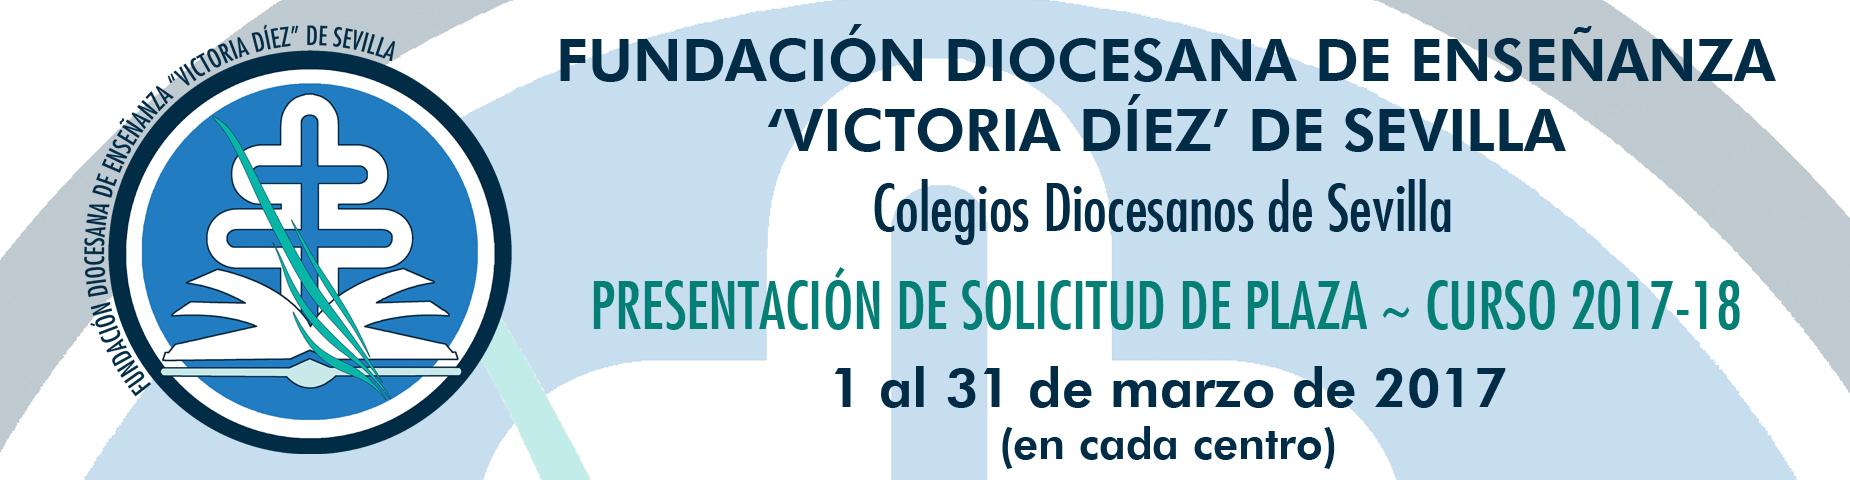 banner solicitud fundacion diocesana